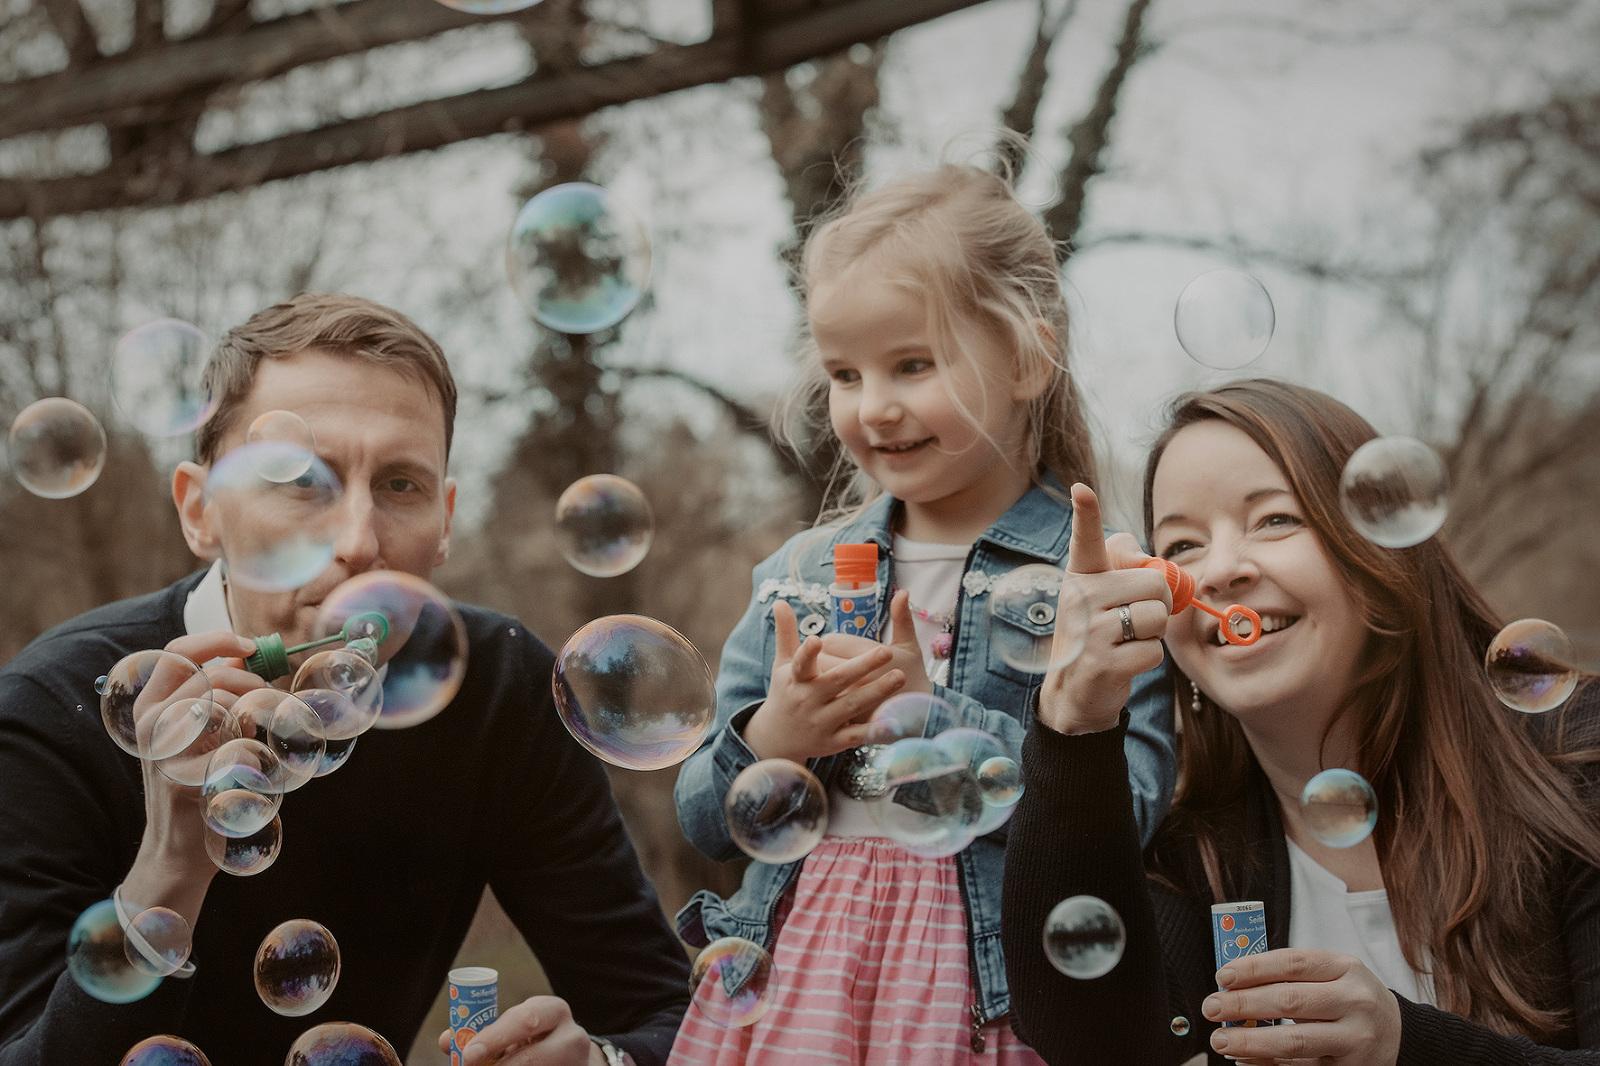 kinderbilder fotografin familienbilder nidderau bruchköbel hessen fotograf frankfurt natürliche familienfotografie